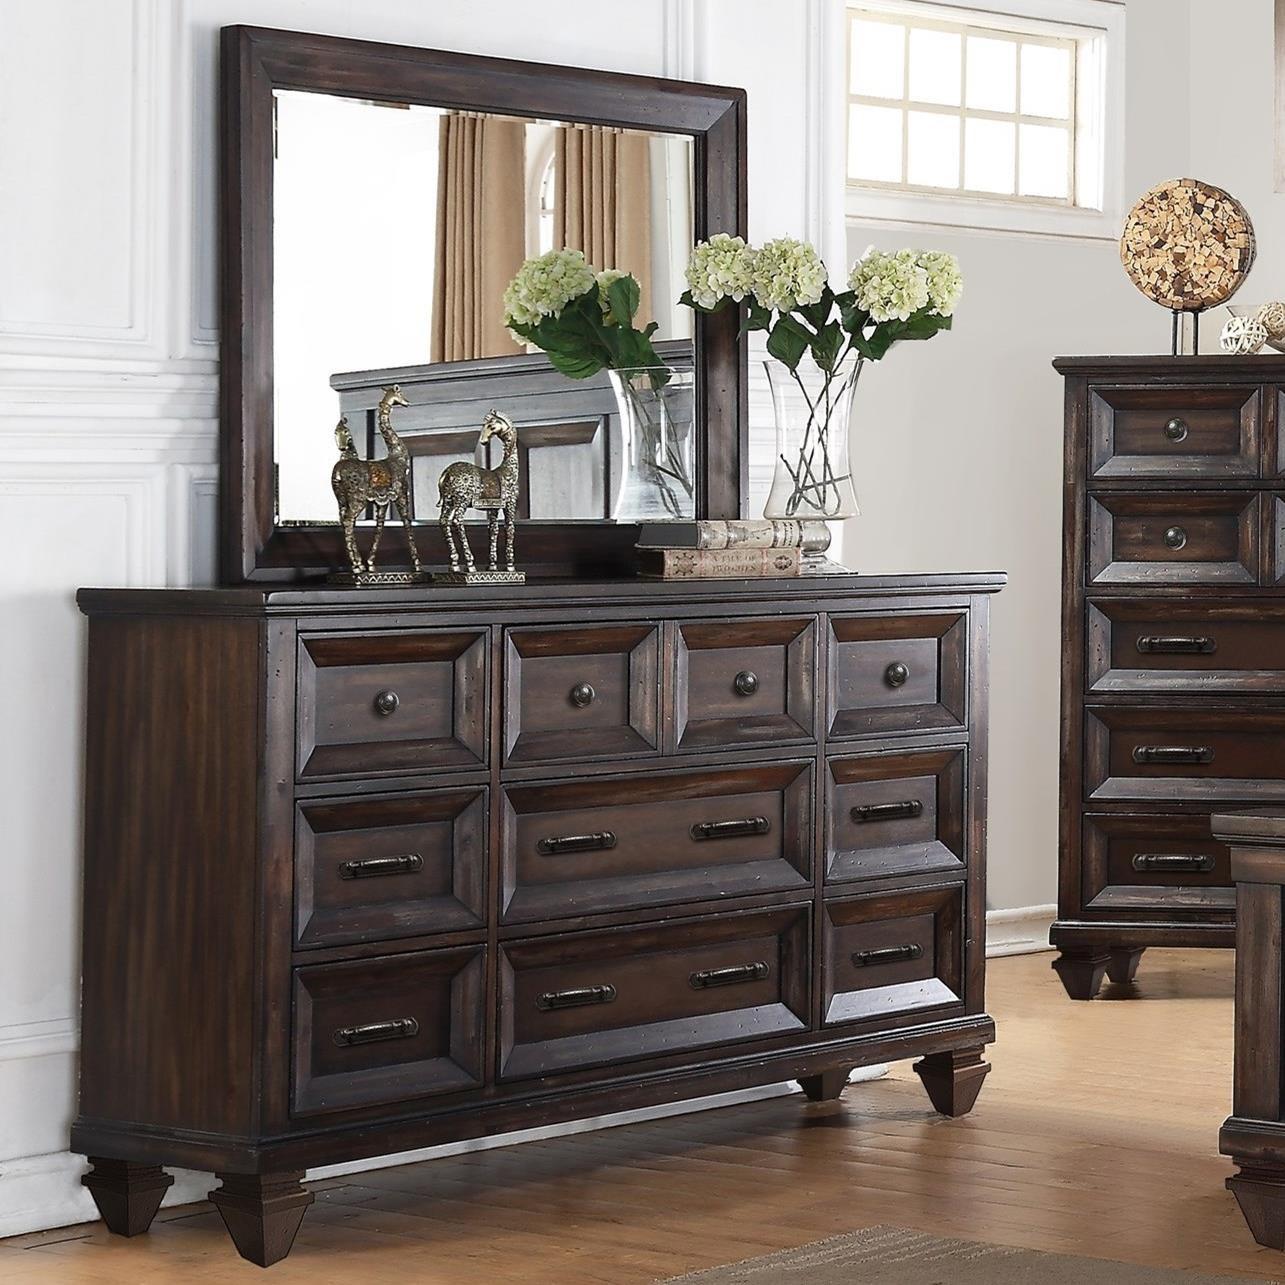 new classic sevilla nine drawer dresser and mirror set great american home store dresser. Black Bedroom Furniture Sets. Home Design Ideas